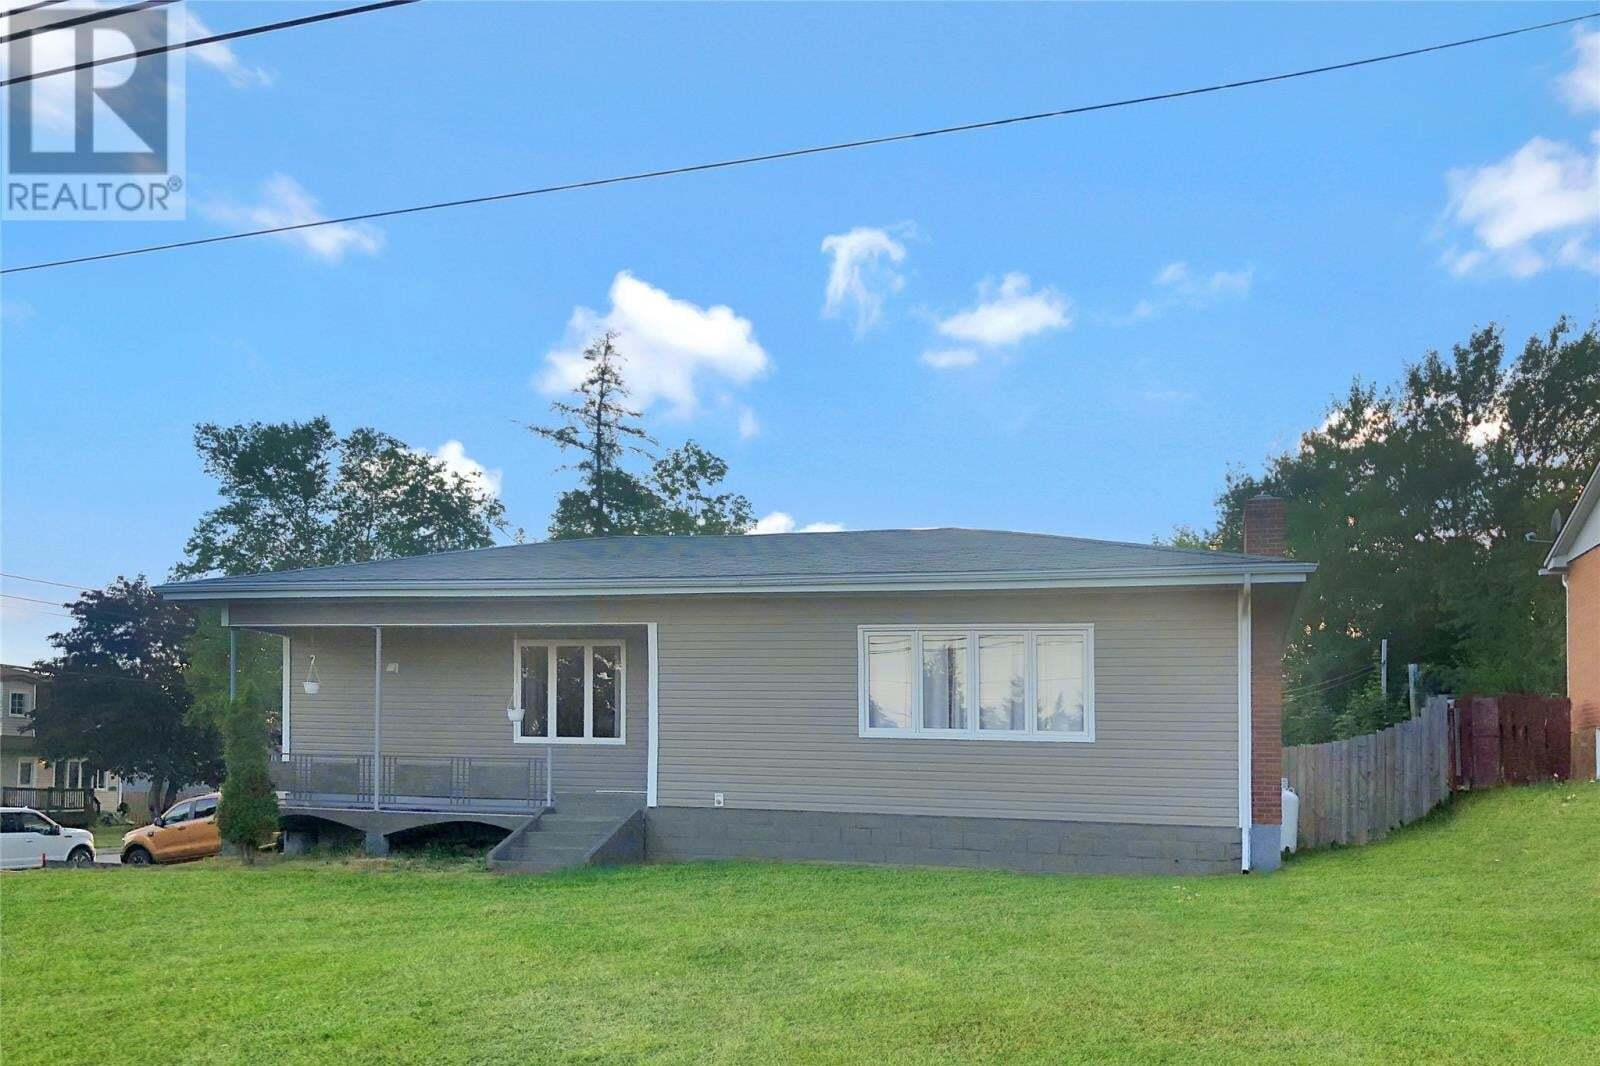 House for sale at 31 Hamilton St Gander Newfoundland - MLS: 1219018